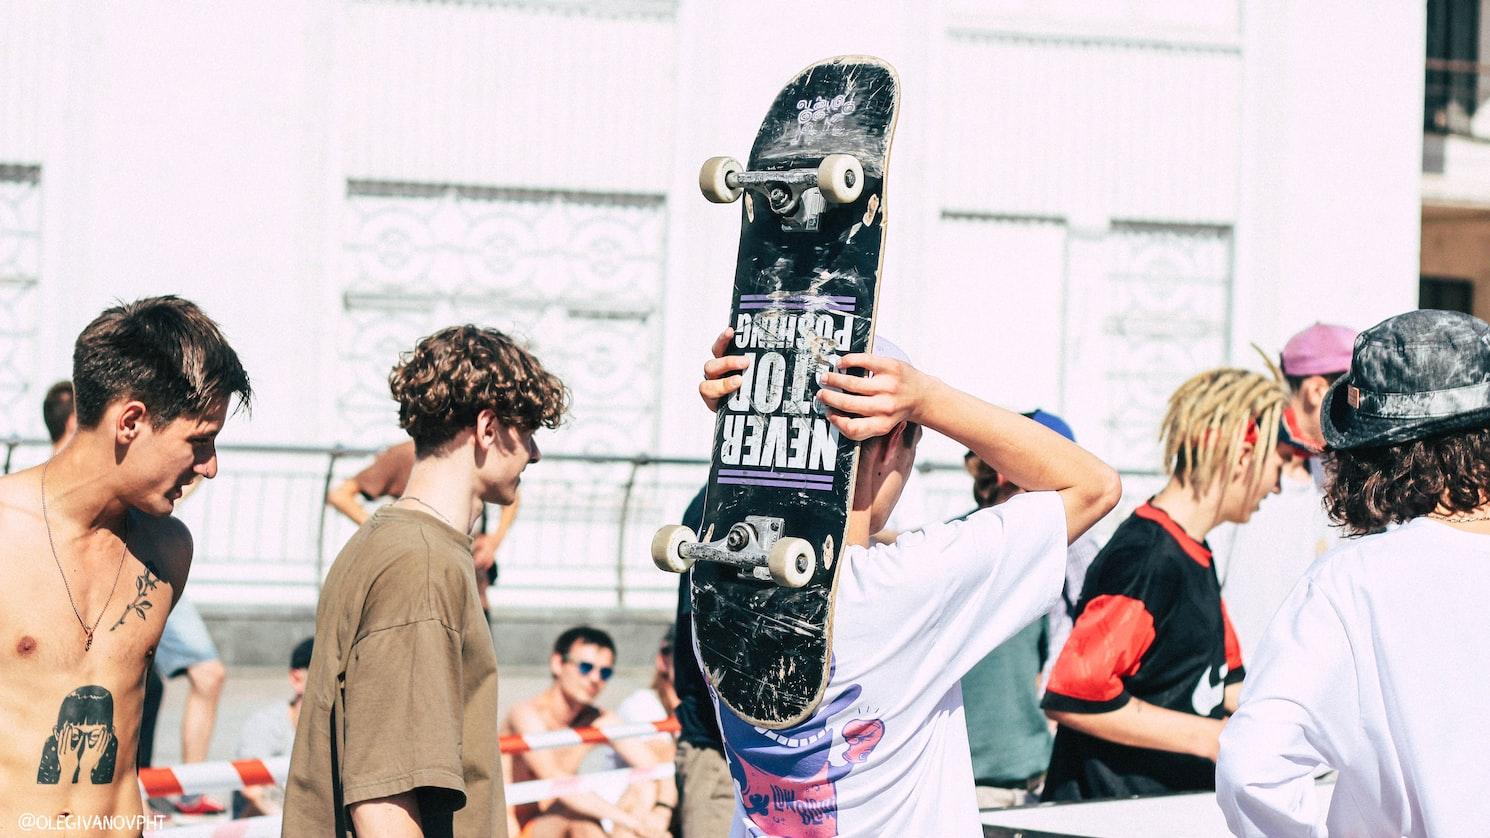 men and skateboard